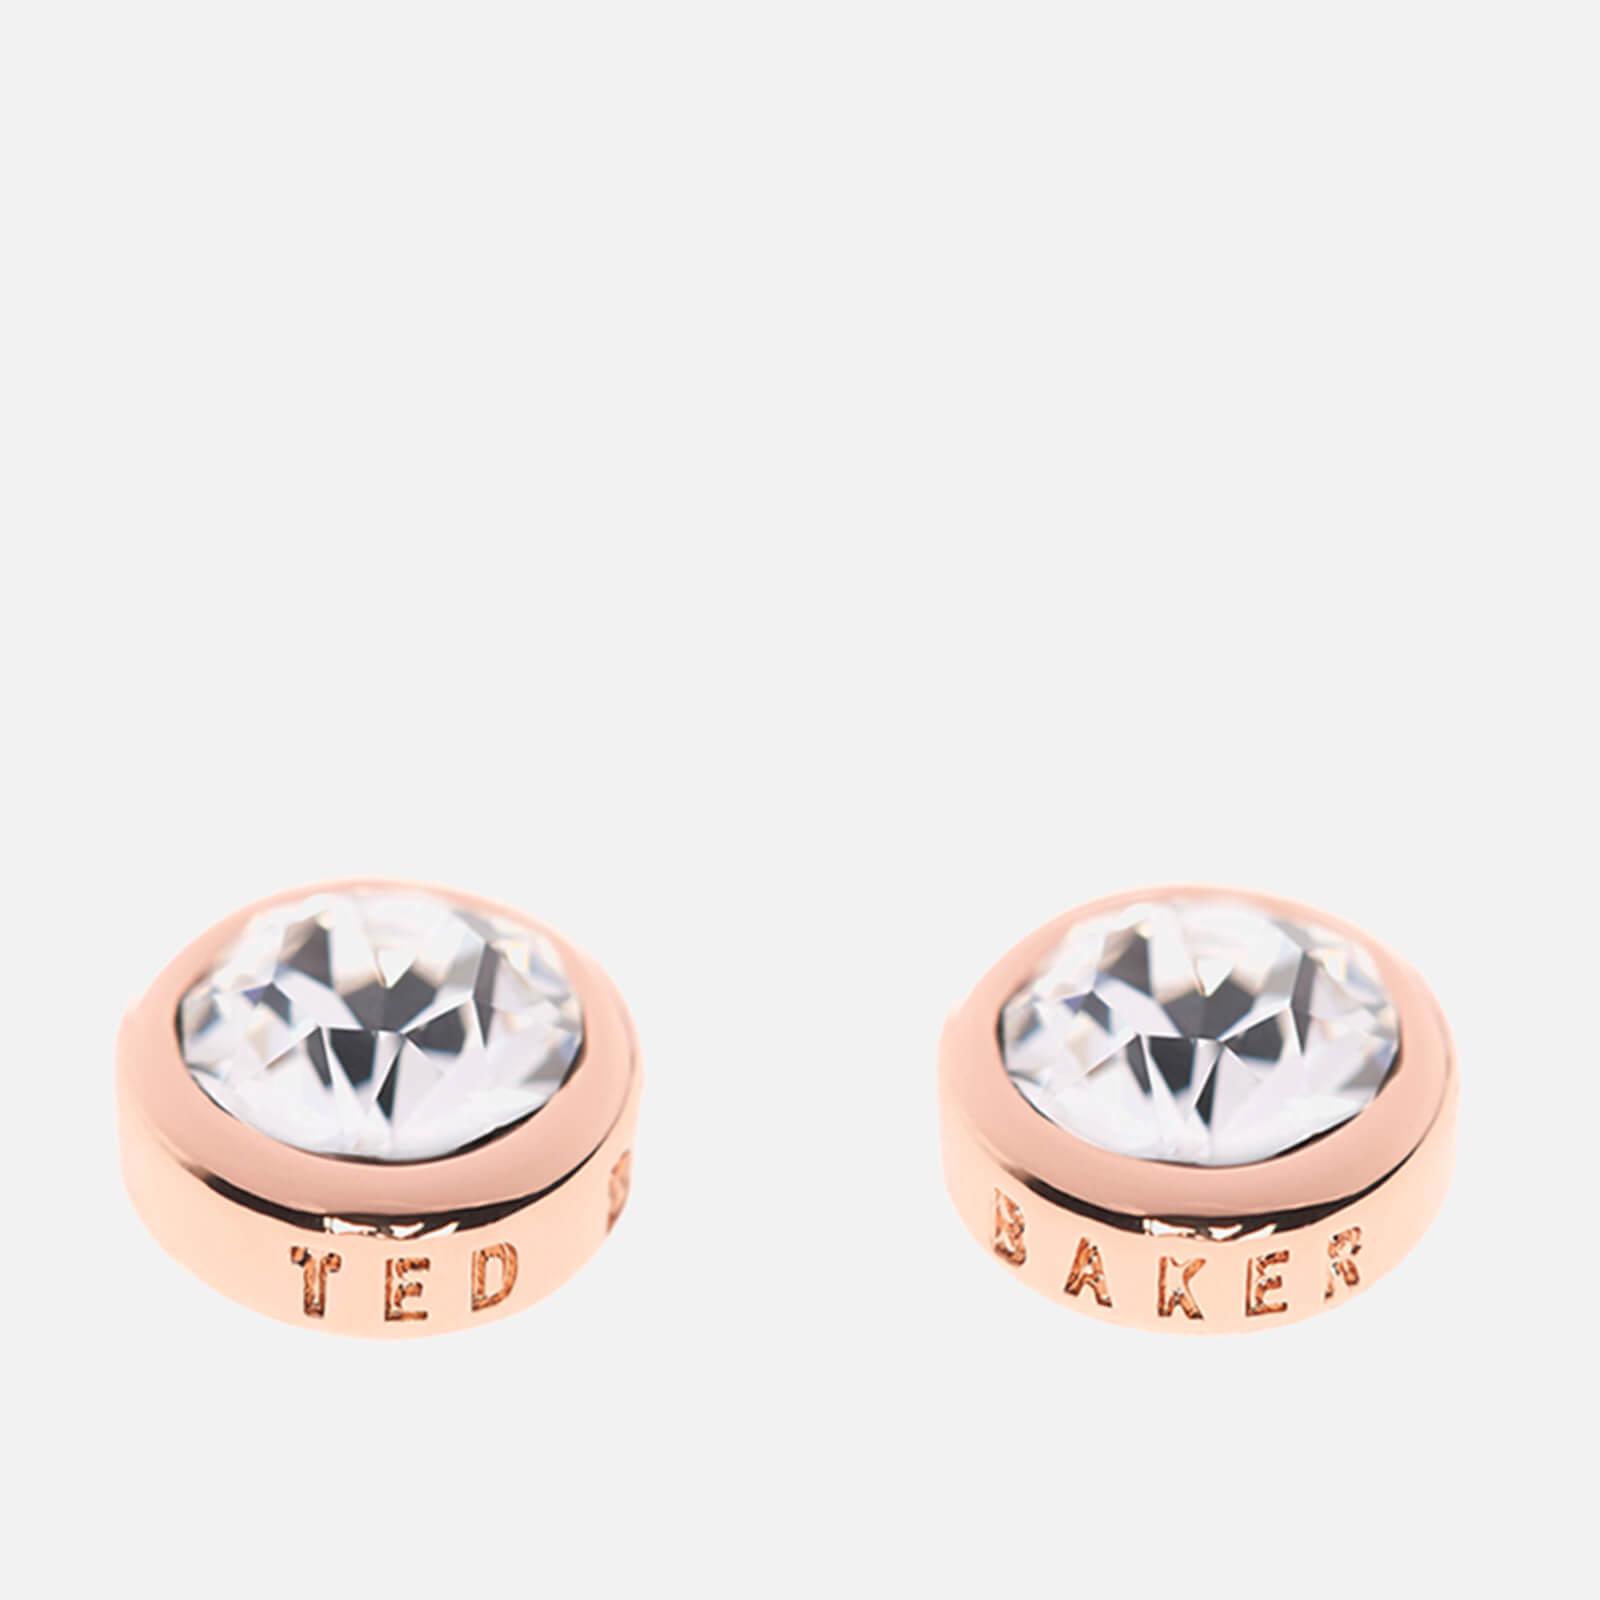 Ted Baker Women's Sinaa Swarovski Crystal Stud Earrings - Rose Gold/Crystal - Silver